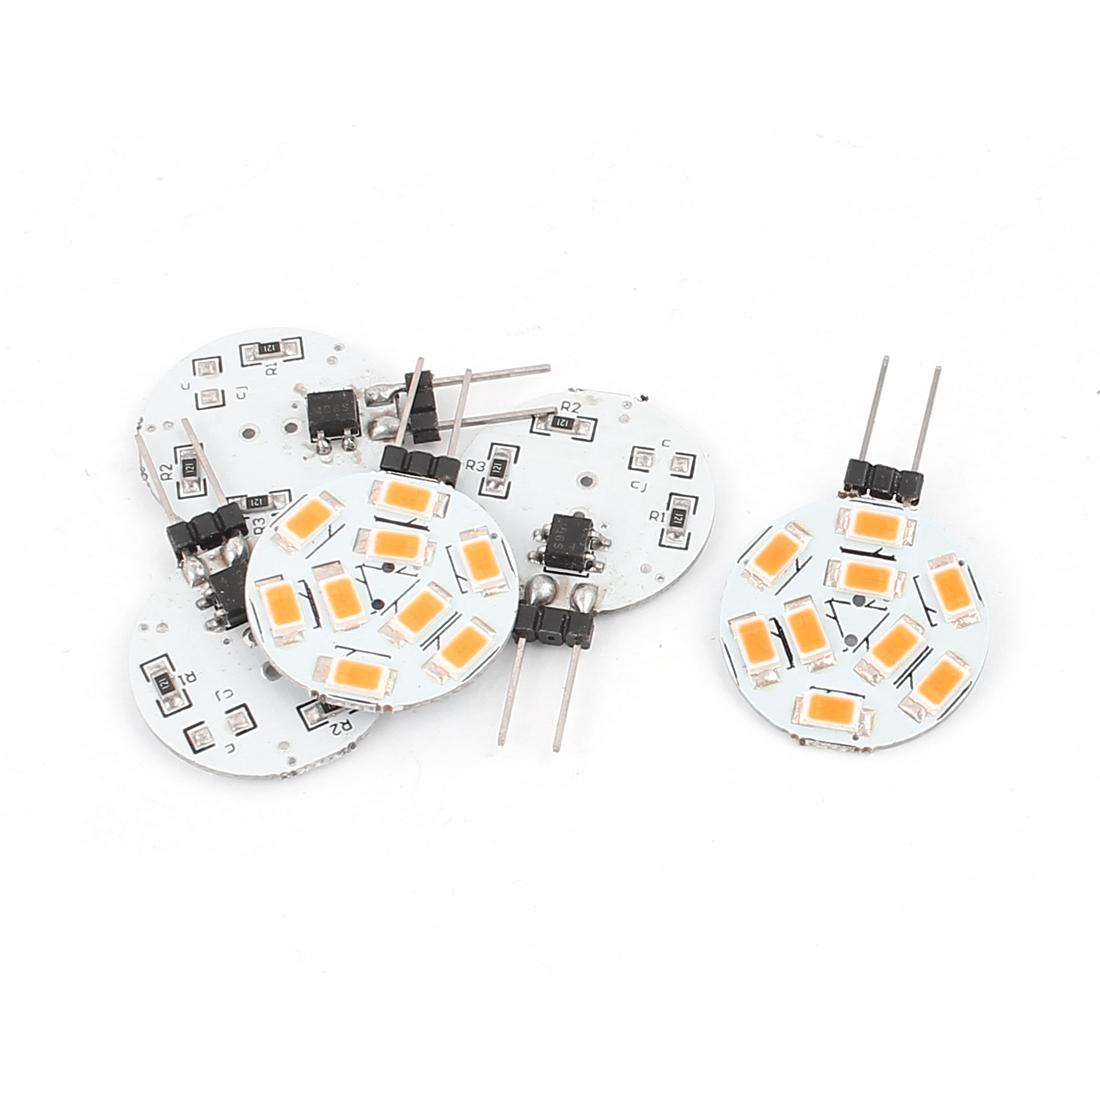 5 Pcs G4 Round Shaped Warm White 5730 SMD 350 Lumen 9 LED Bulb 10-30V 1.7W